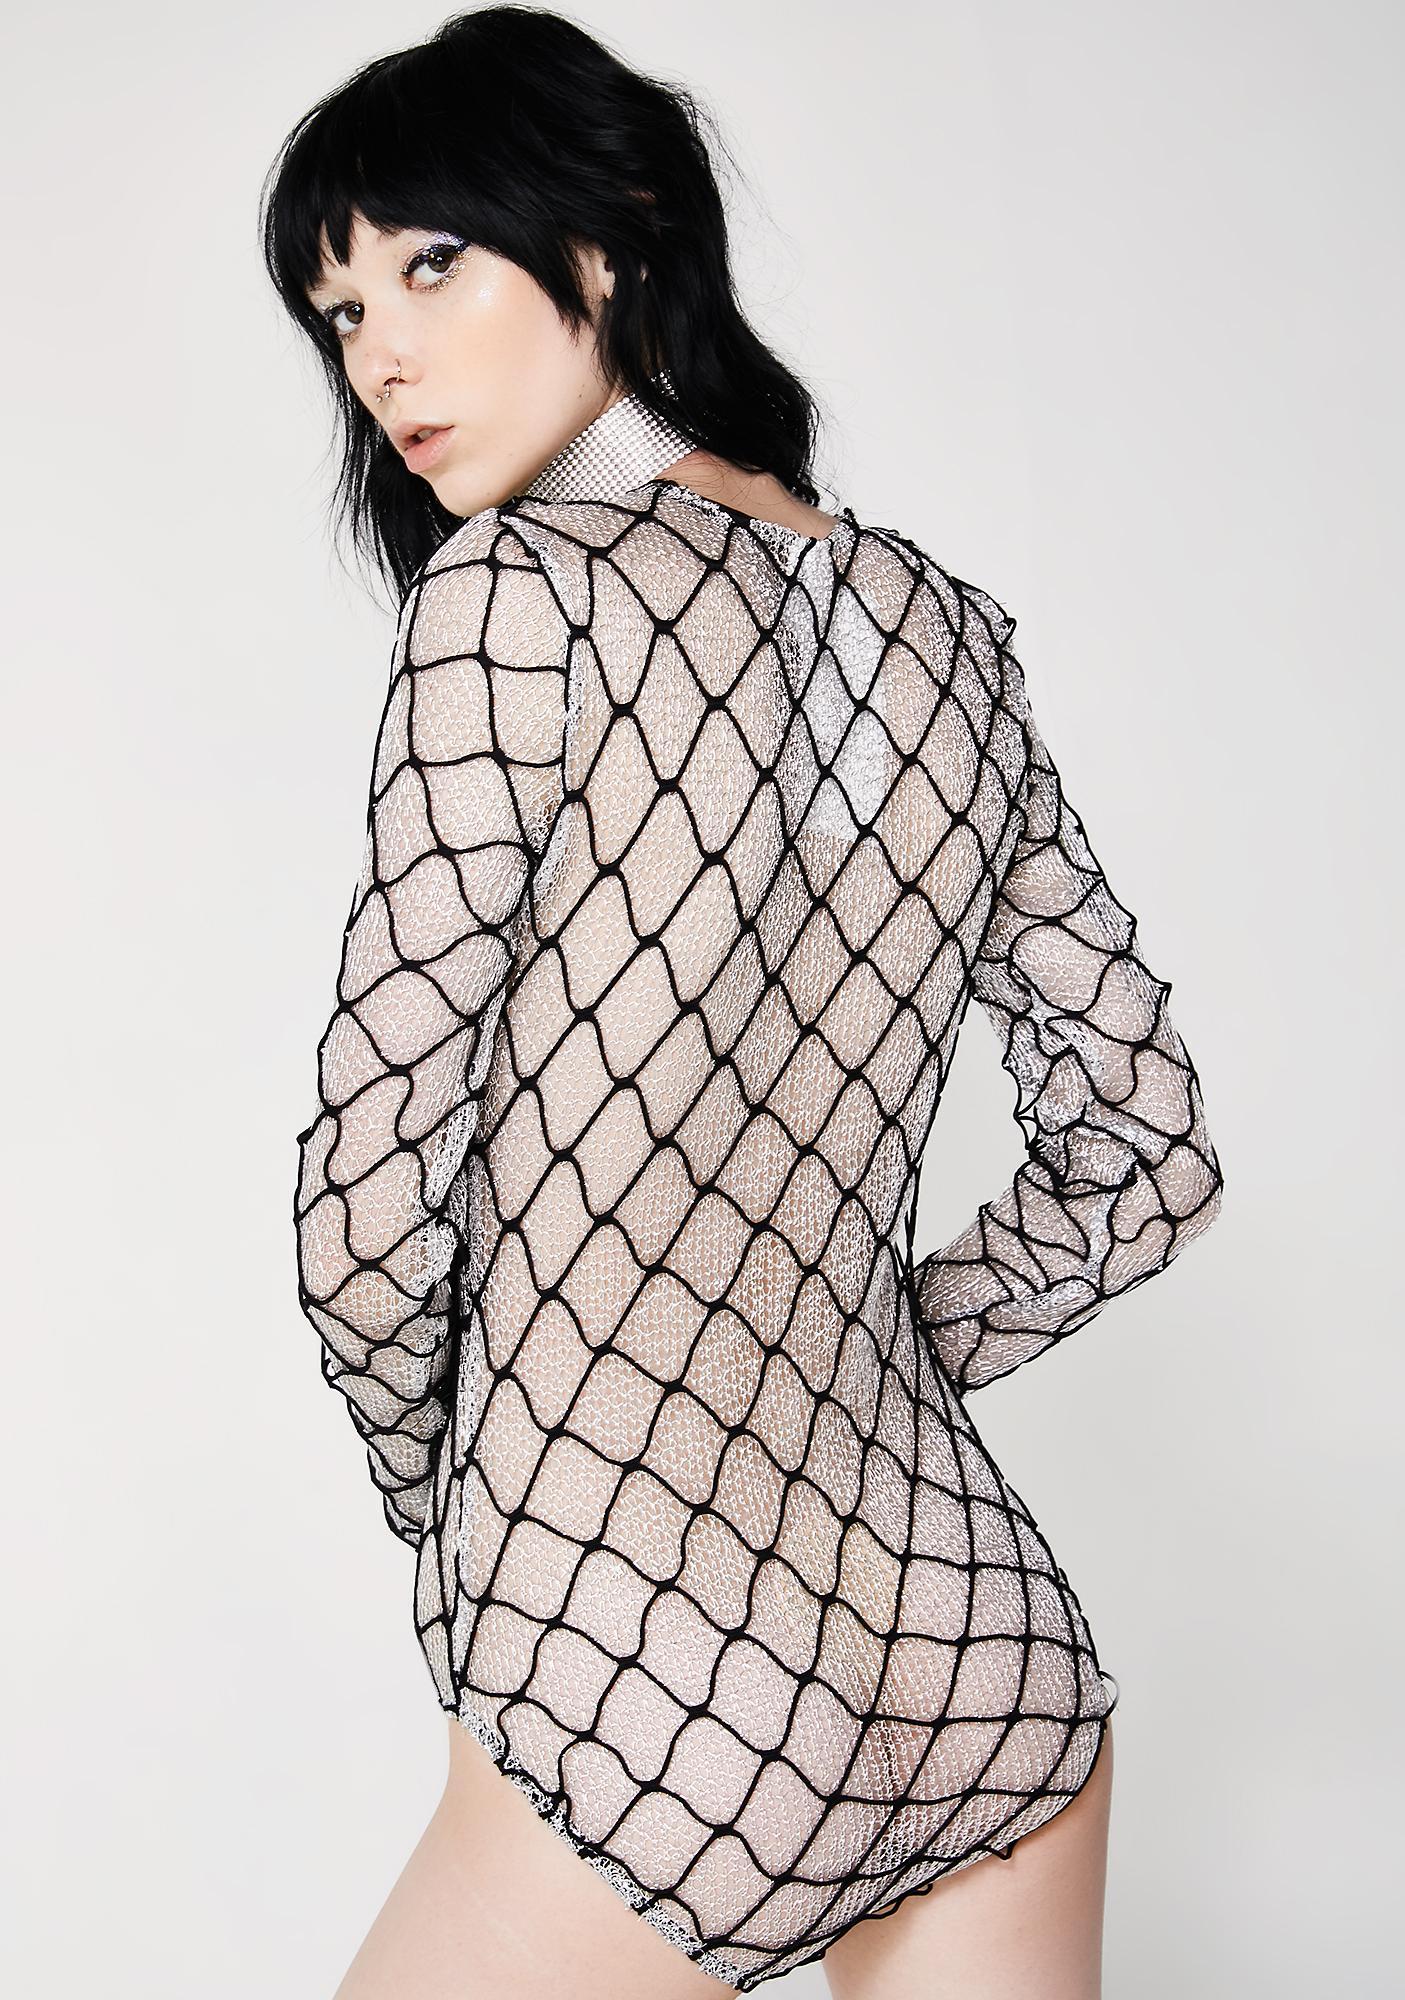 Kiki Riki Catch N' Release Bodysuit